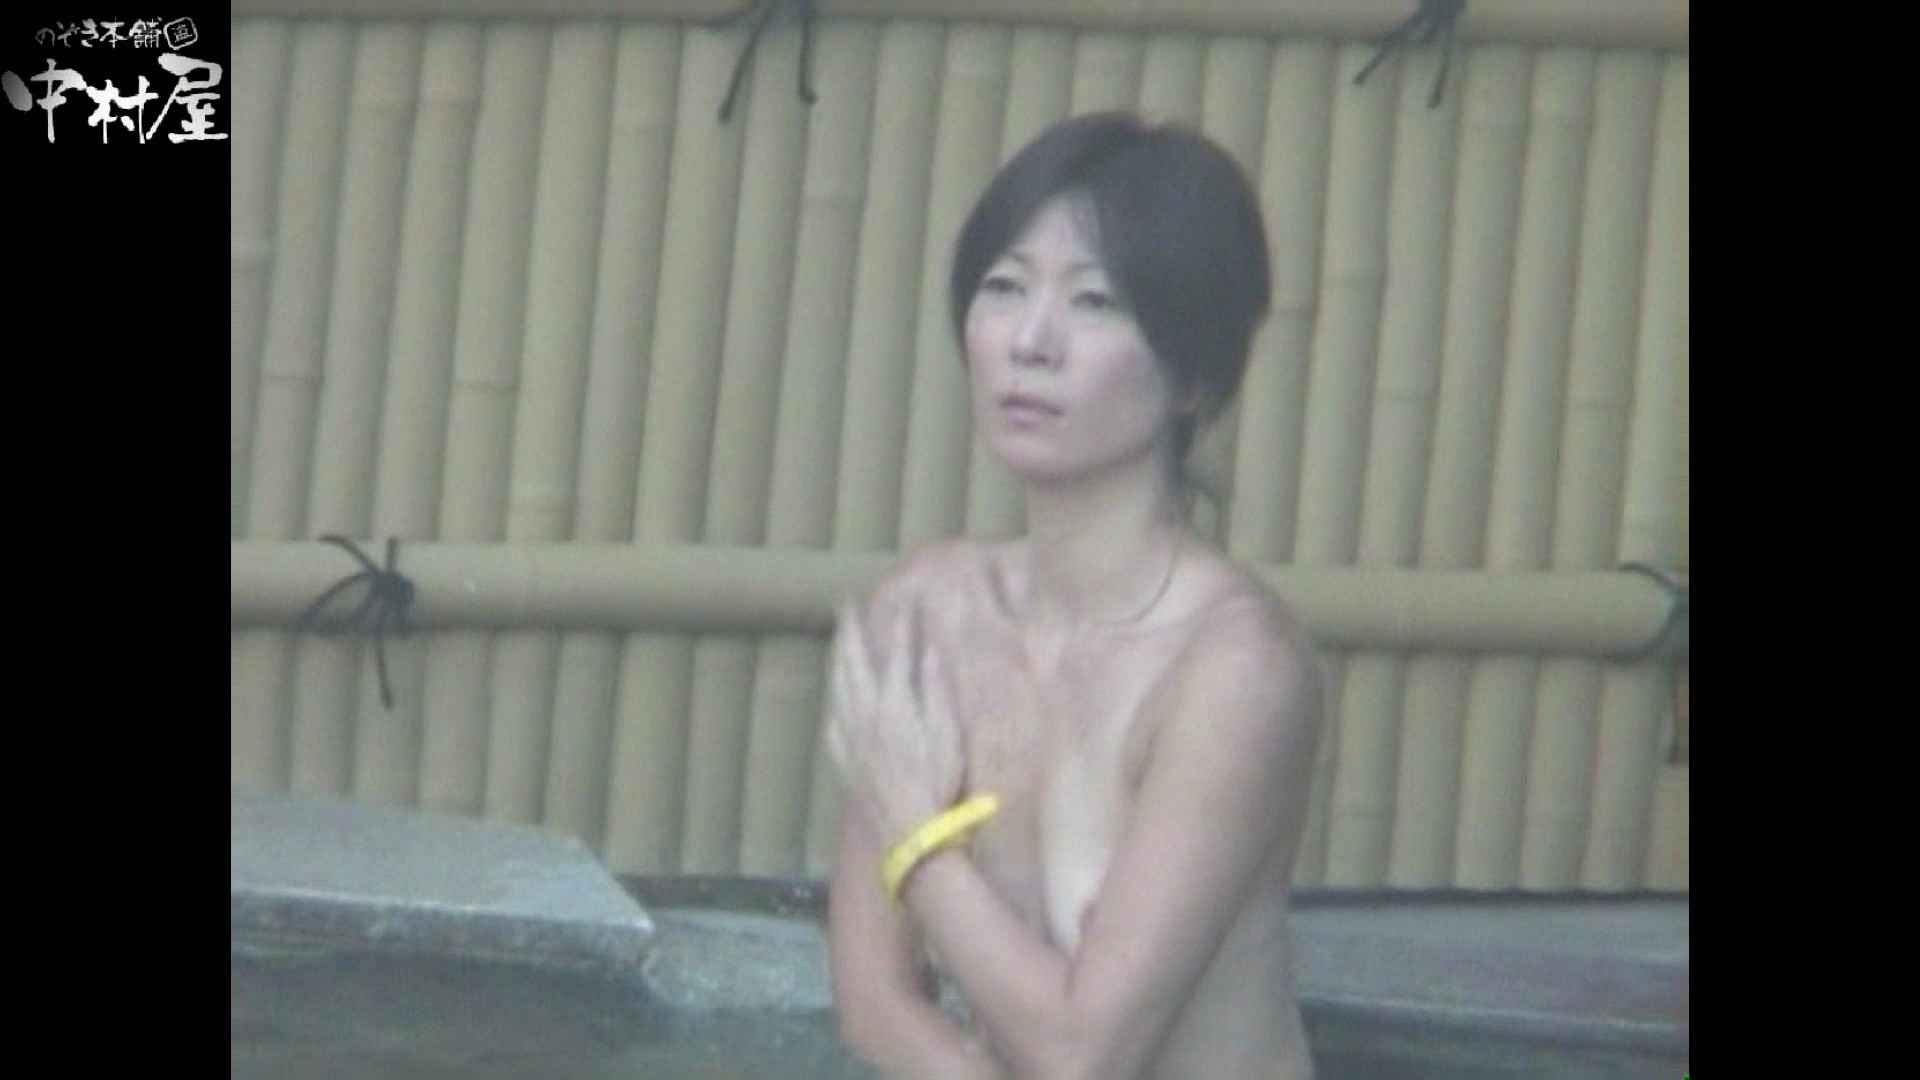 Aquaな露天風呂Vol.972 露天風呂 セックス無修正動画無料 105連発 104